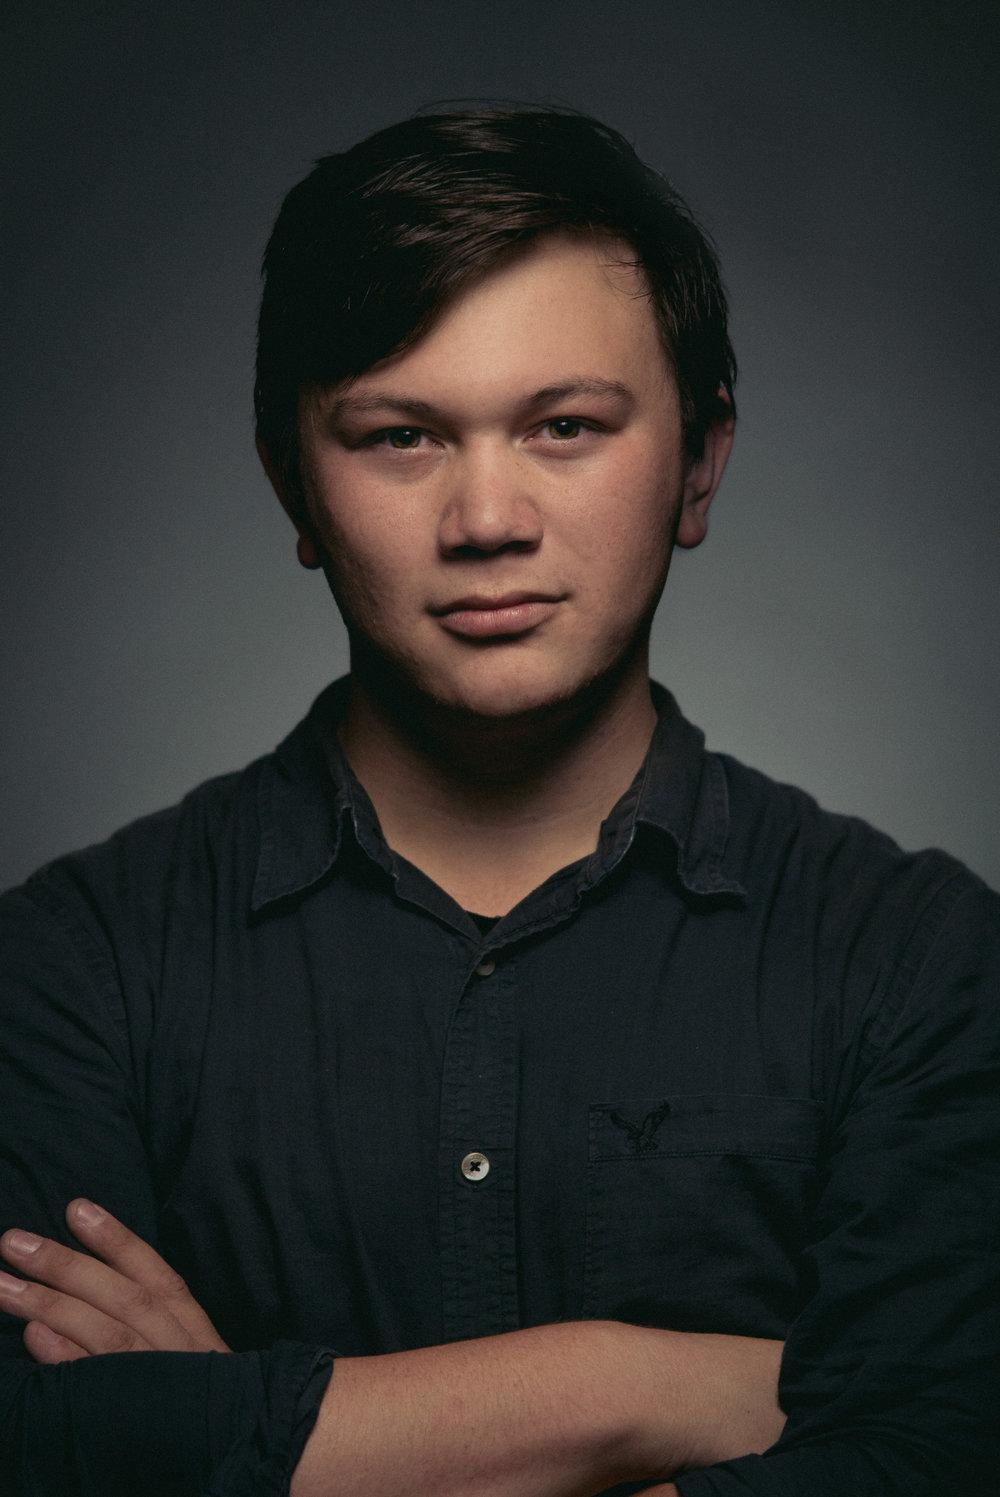 Shane Profile pic-1.jpg